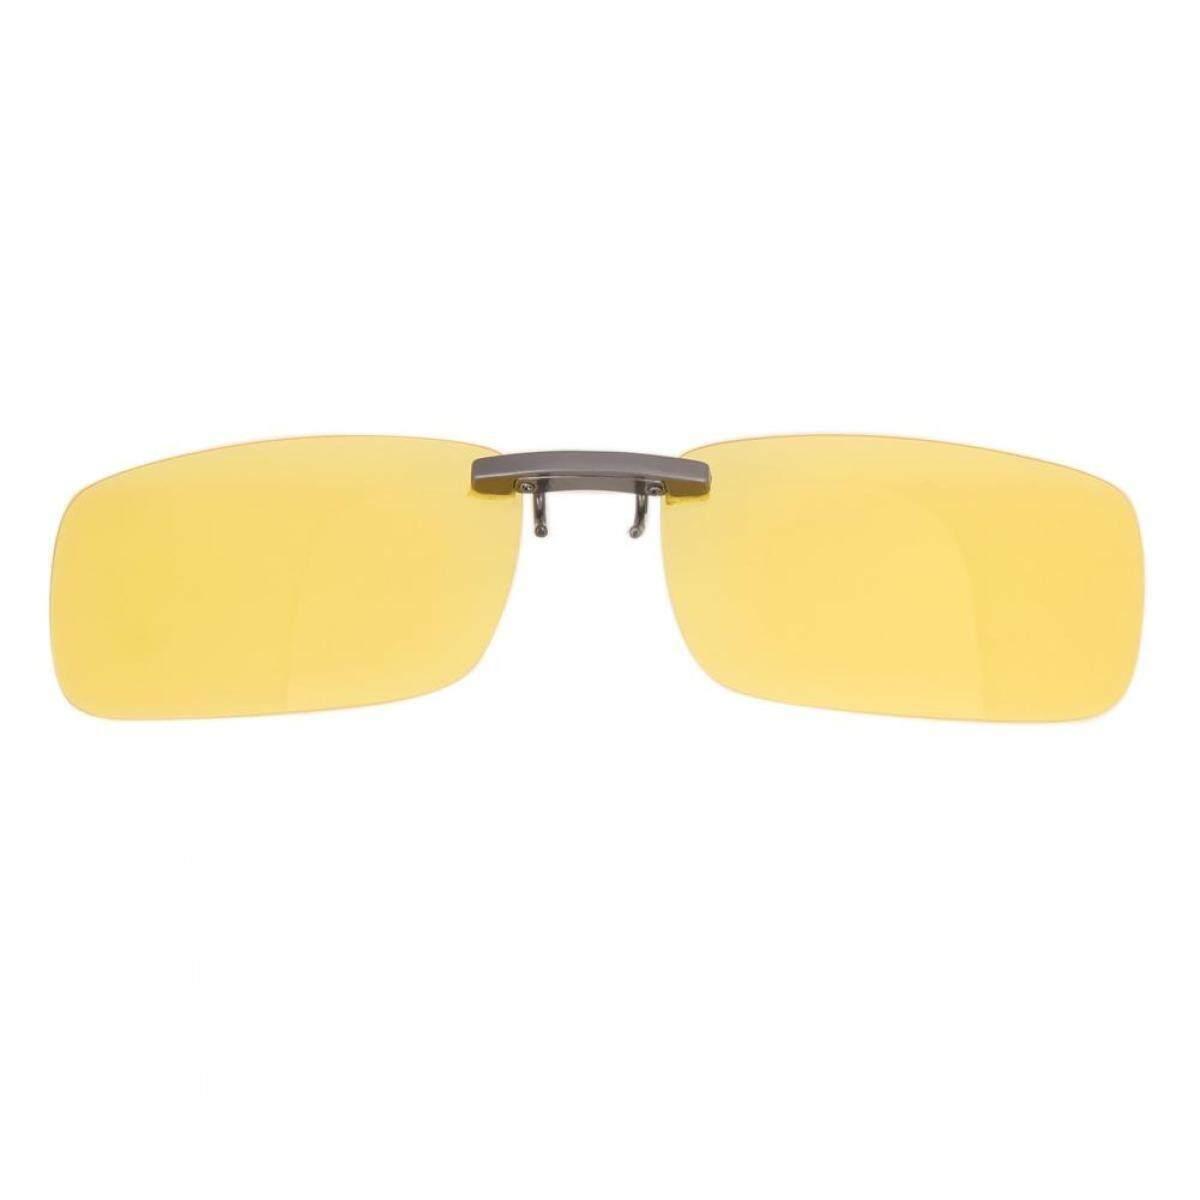 UV400 Unisex Night Driving Glasses Anti Glare Vision Sunglasses Clip (1#)